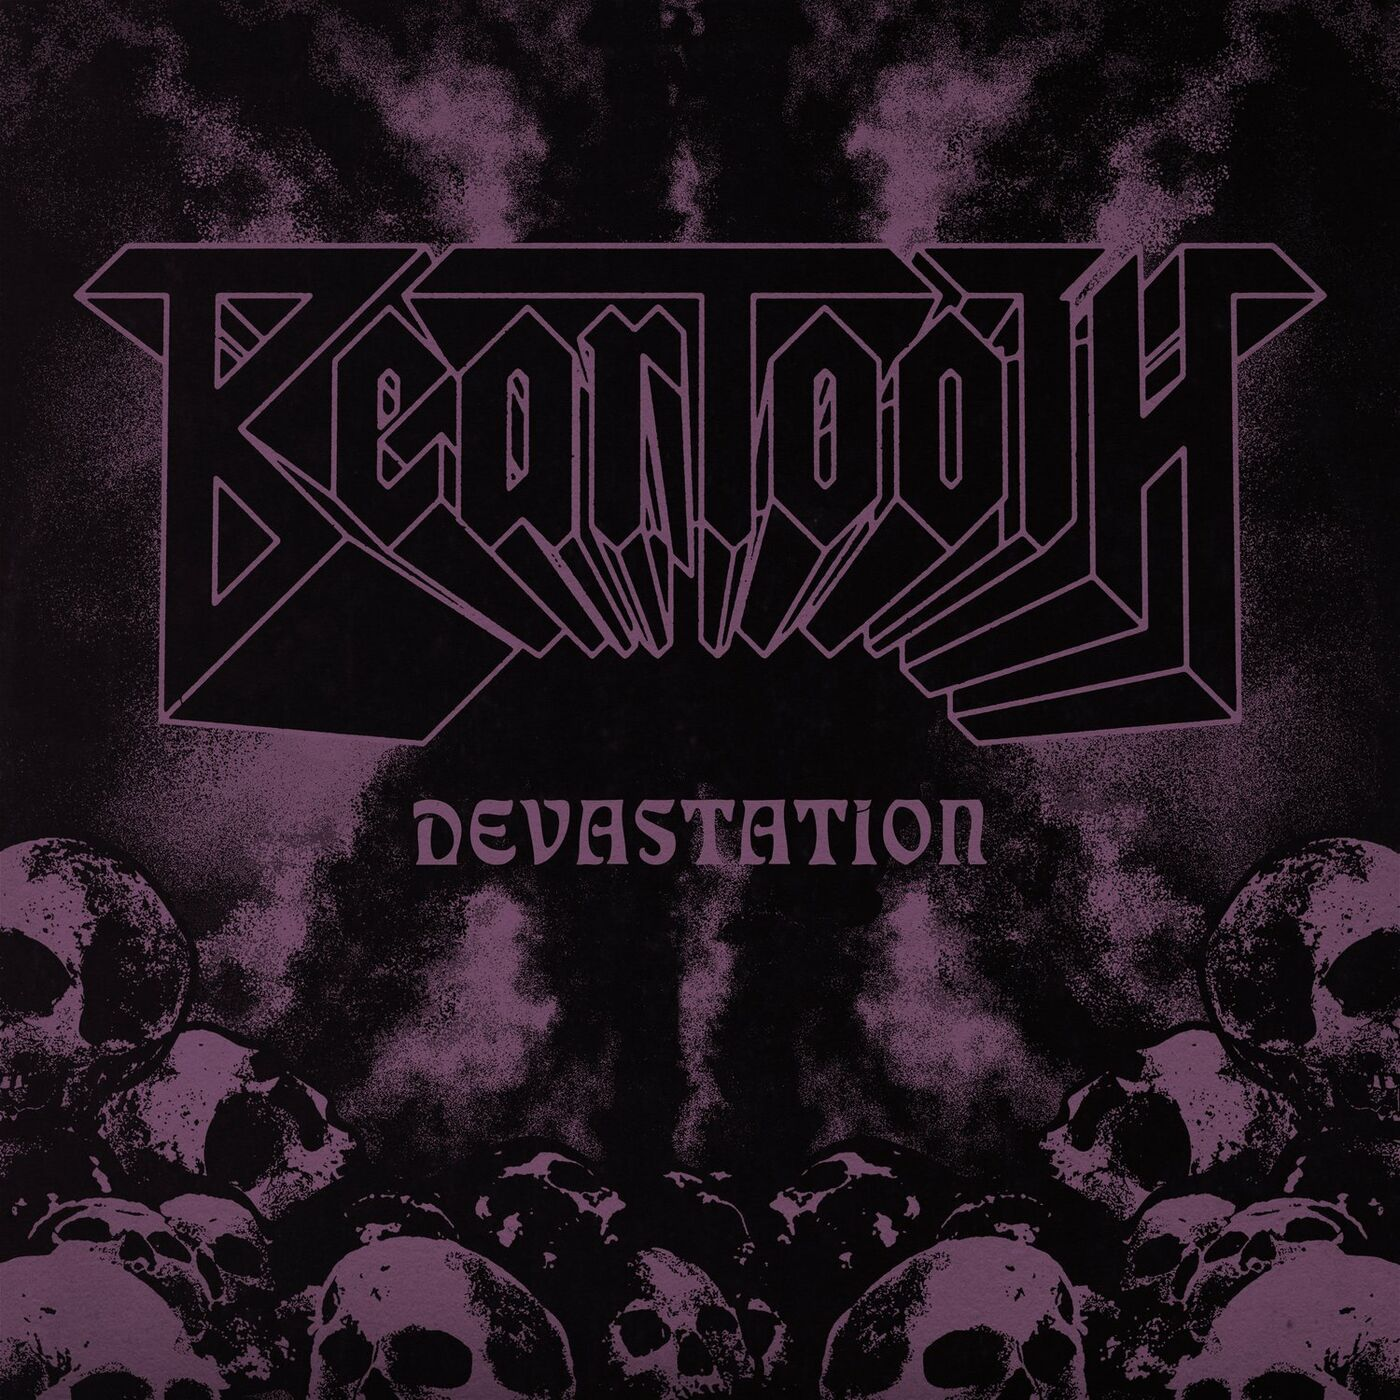 Beartooth - Devastation [single] (2021)